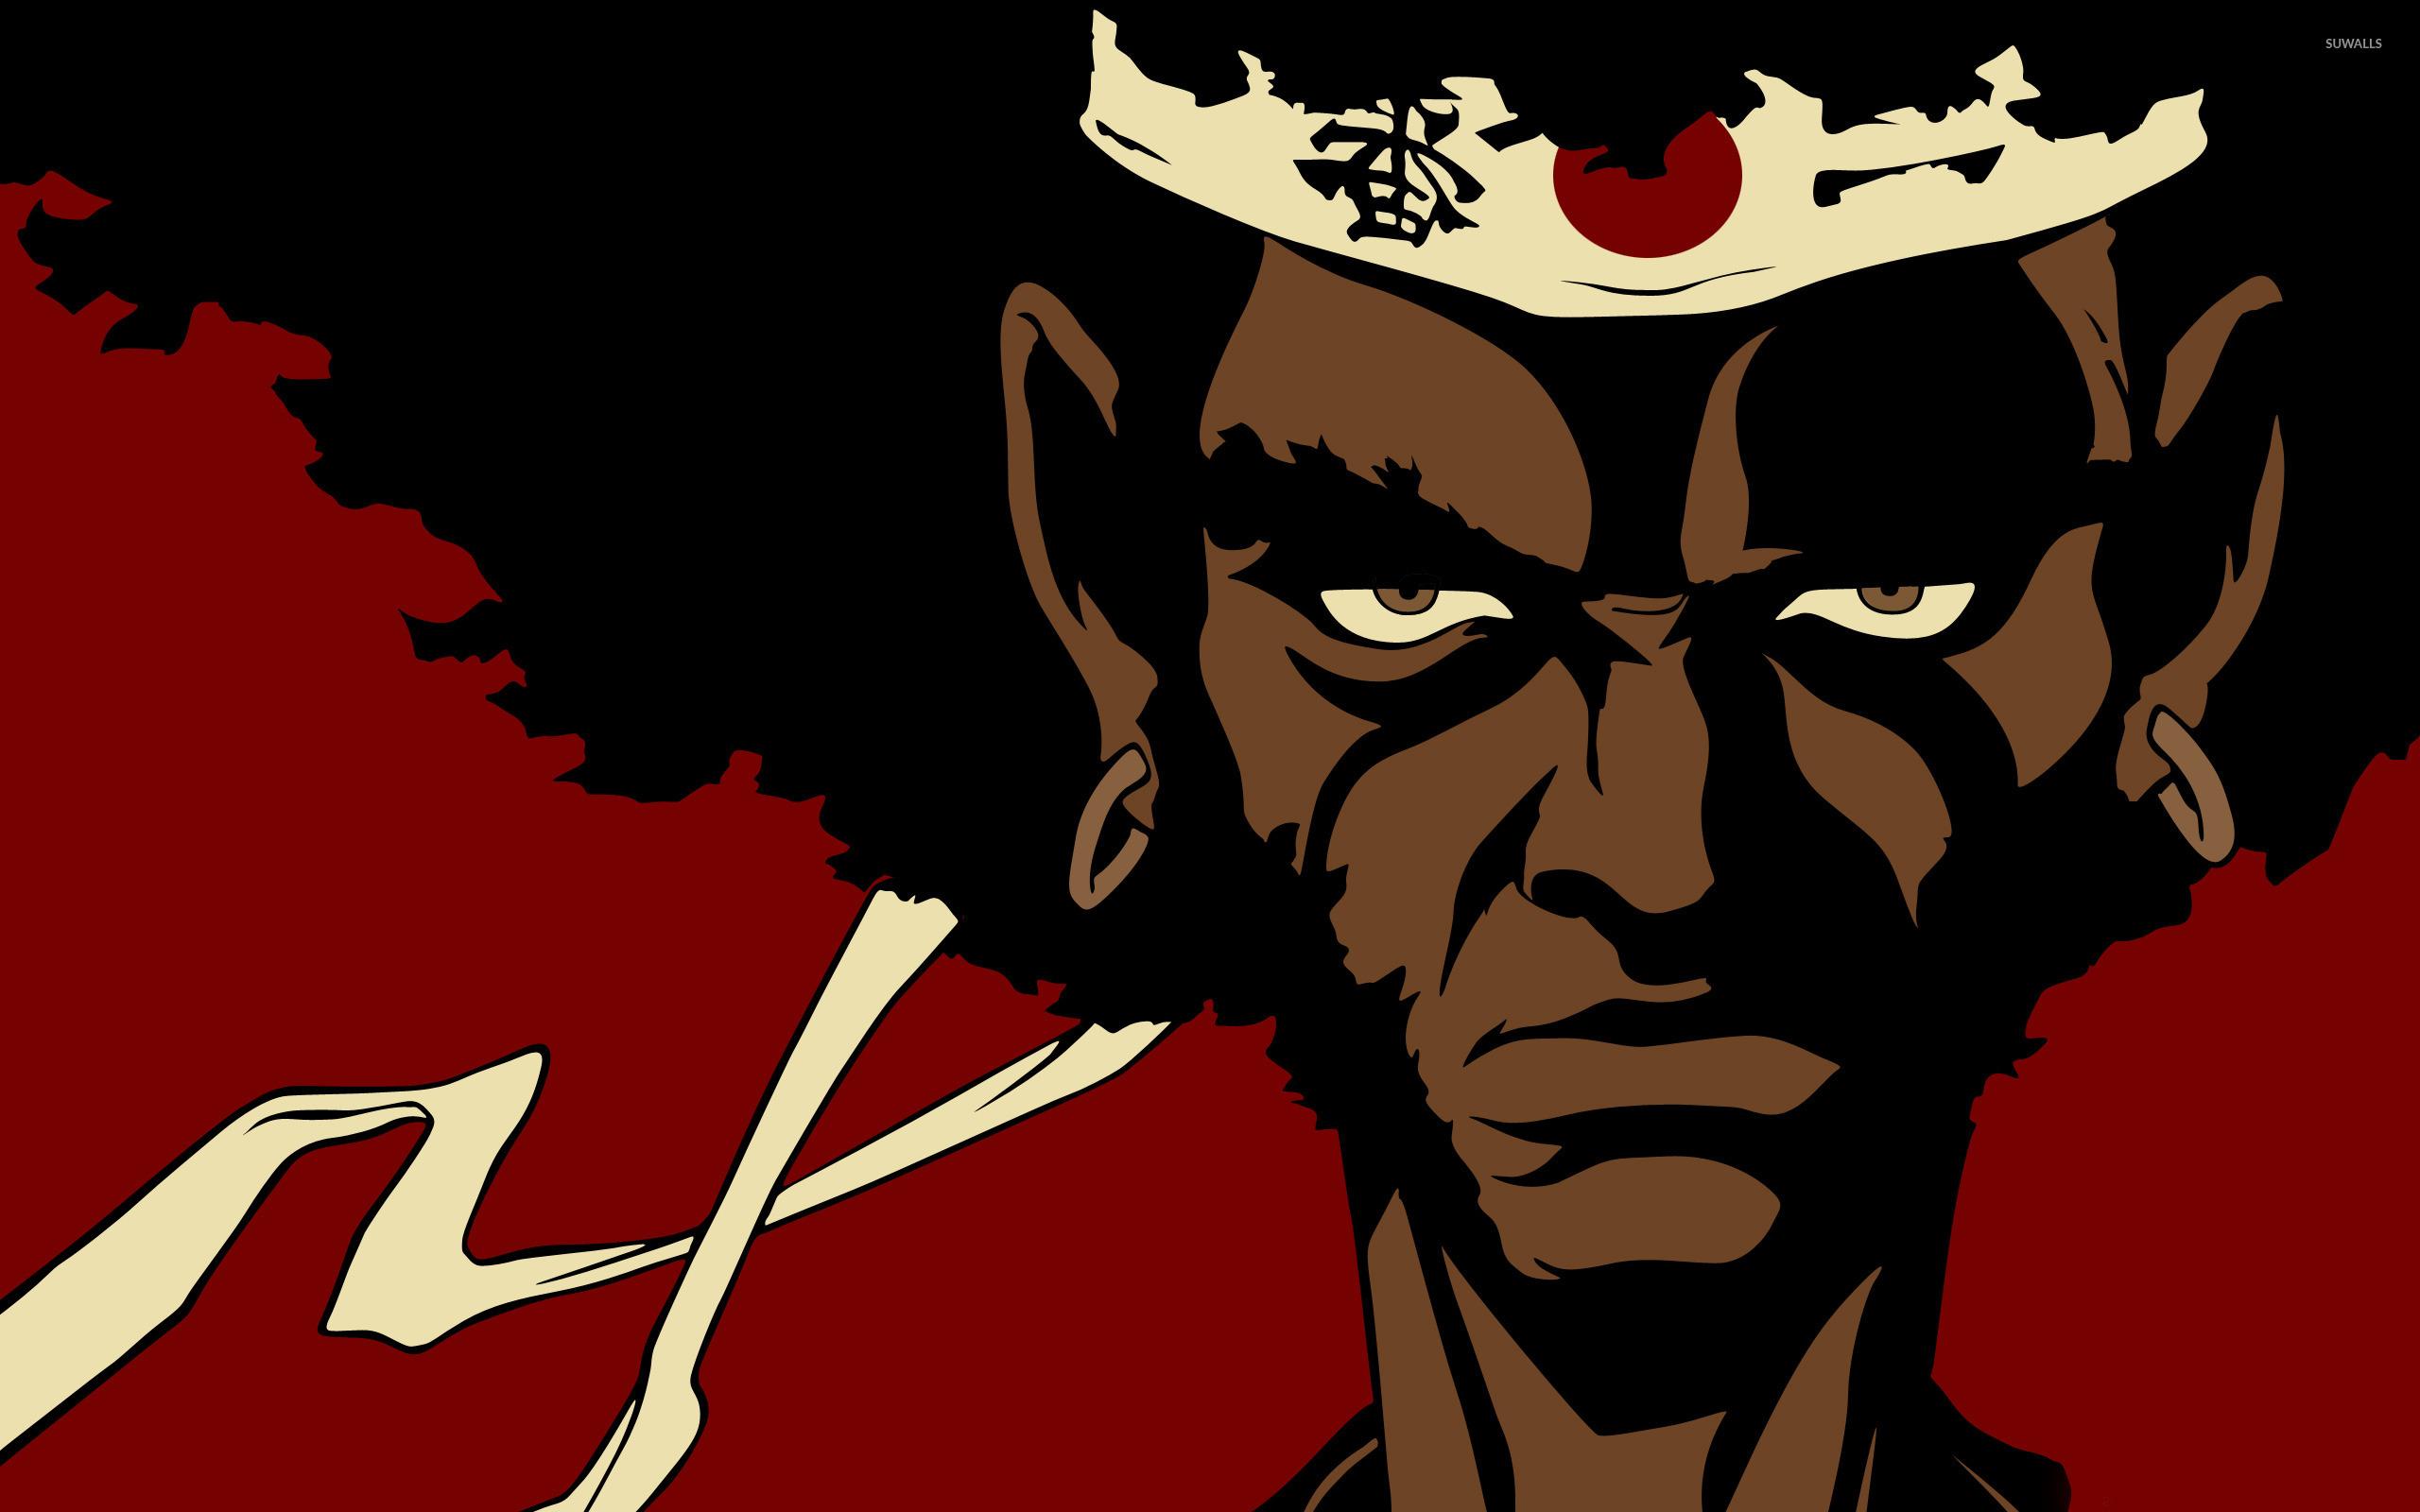 Afro Samurai 4 Wallpaper